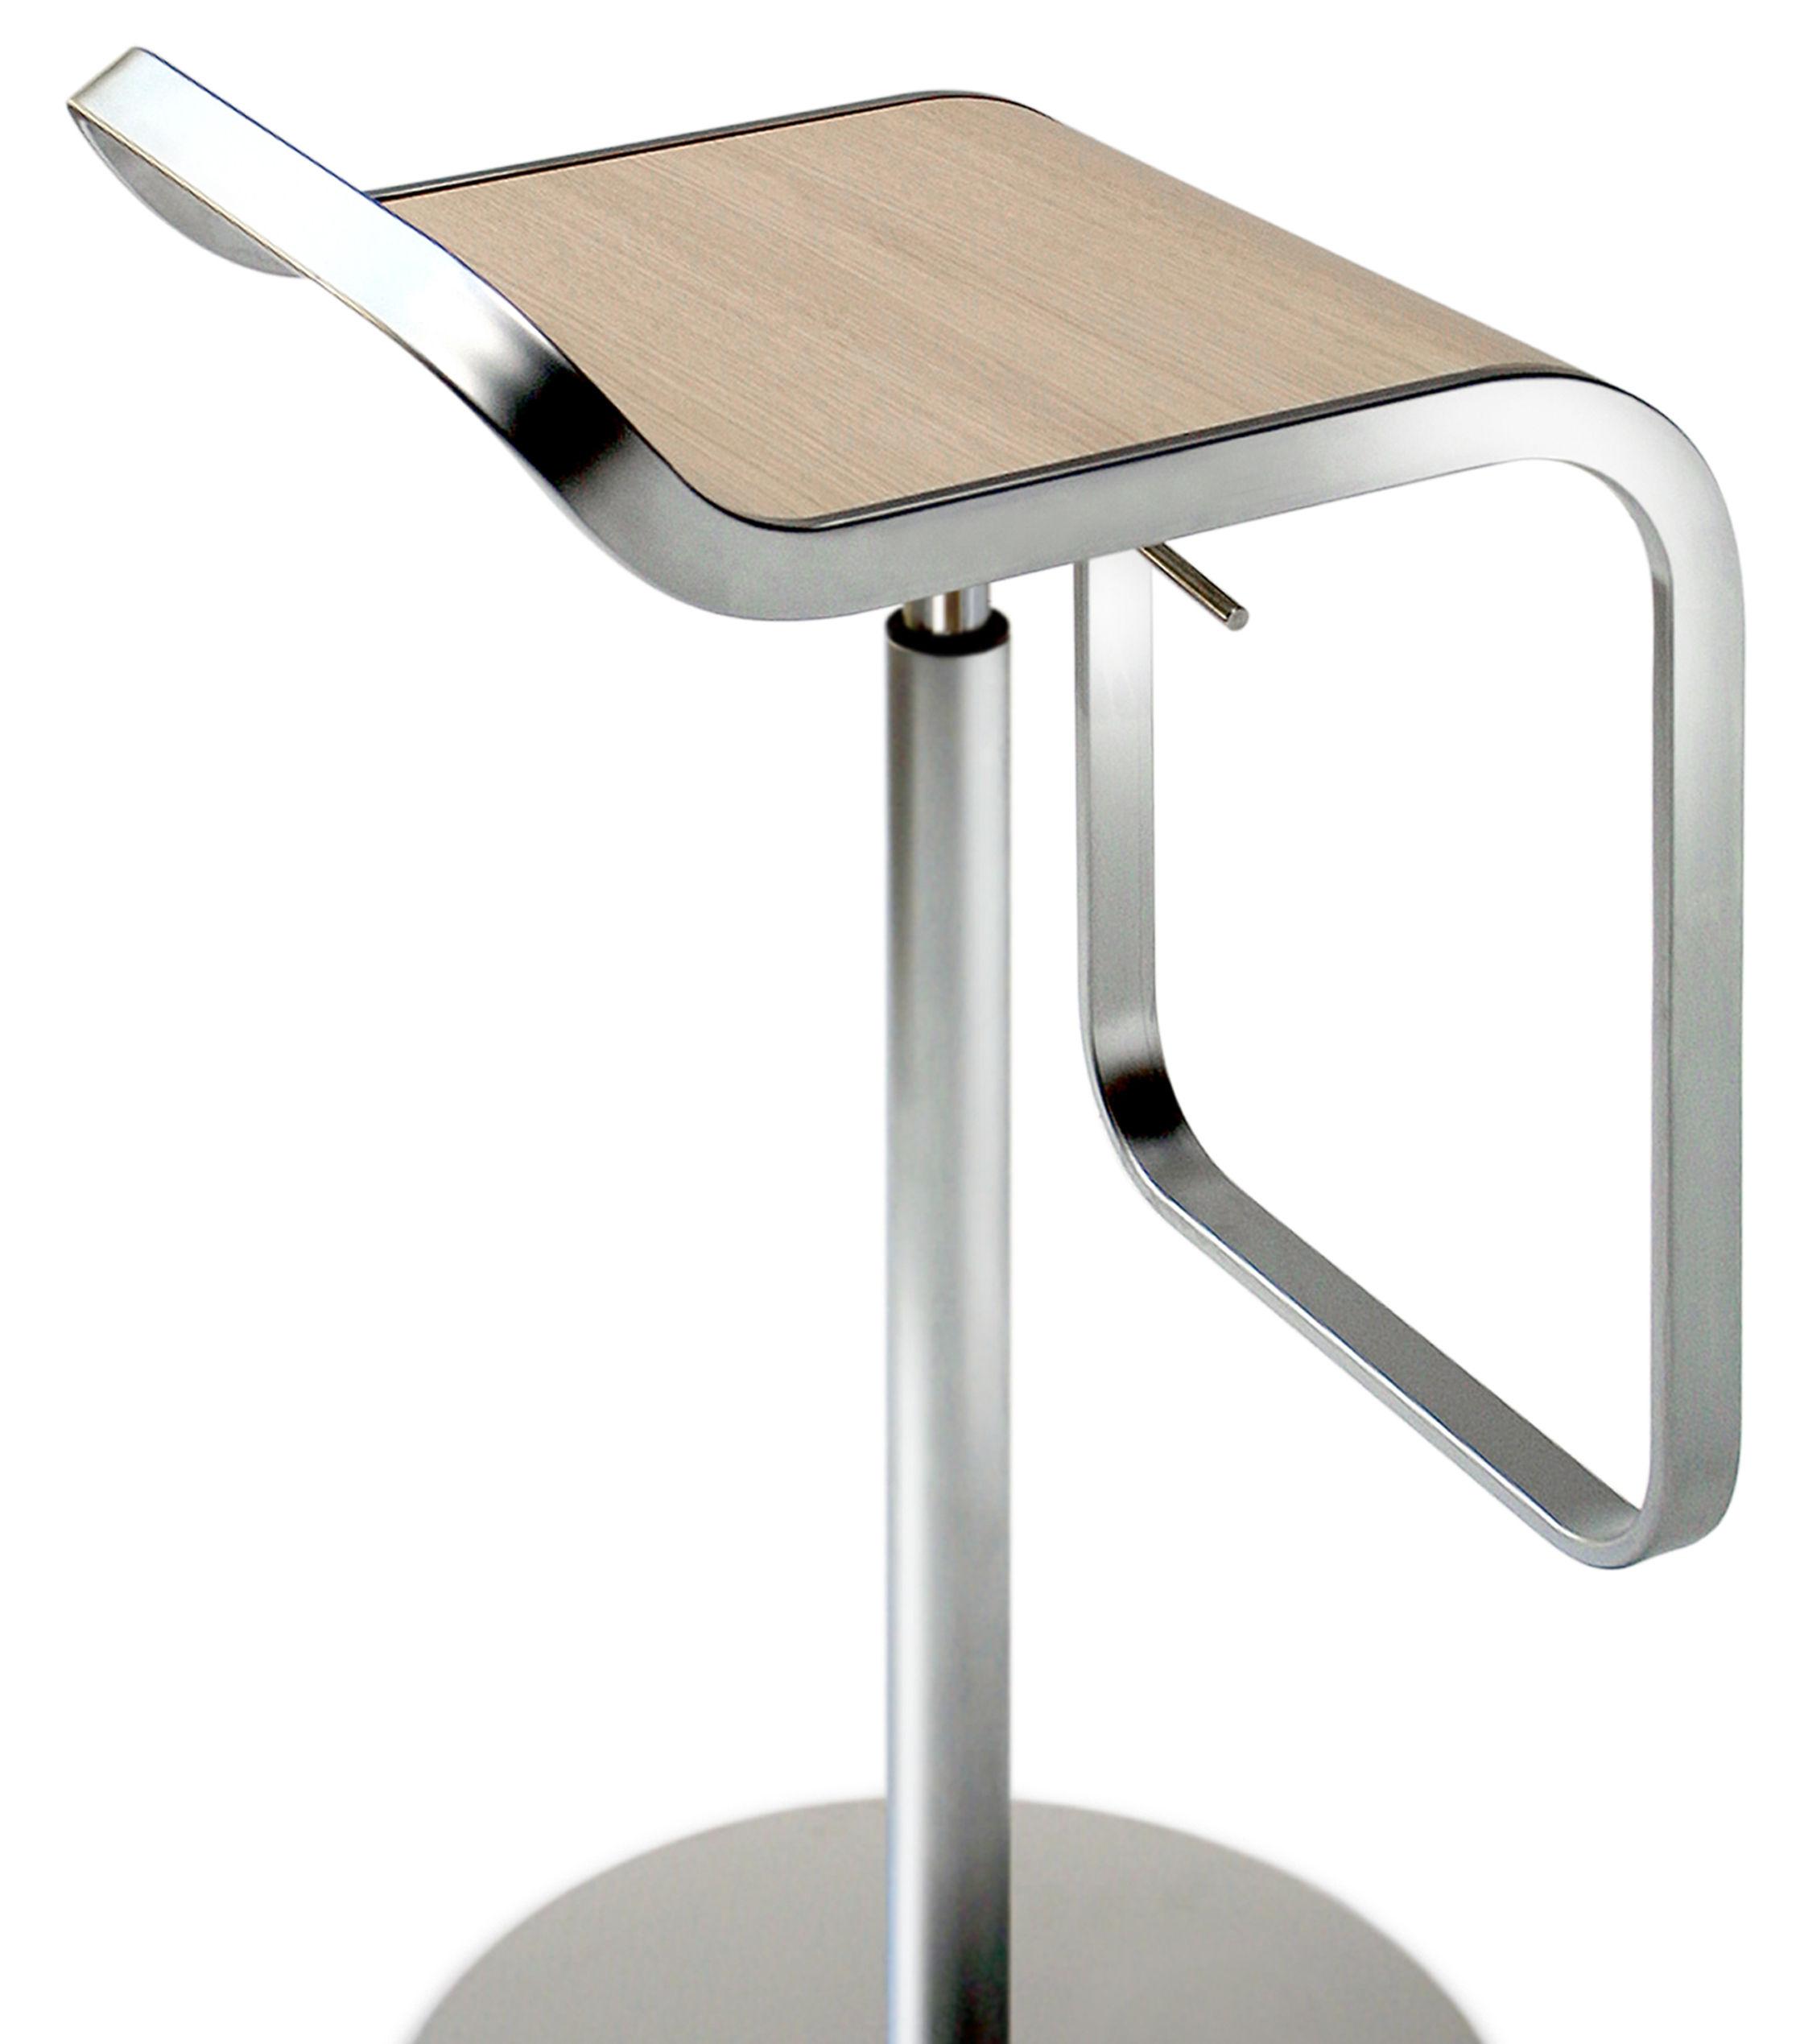 Furniture Bar Stools Lem Adjule Stool Pivoting Wood Seat By Lapalma